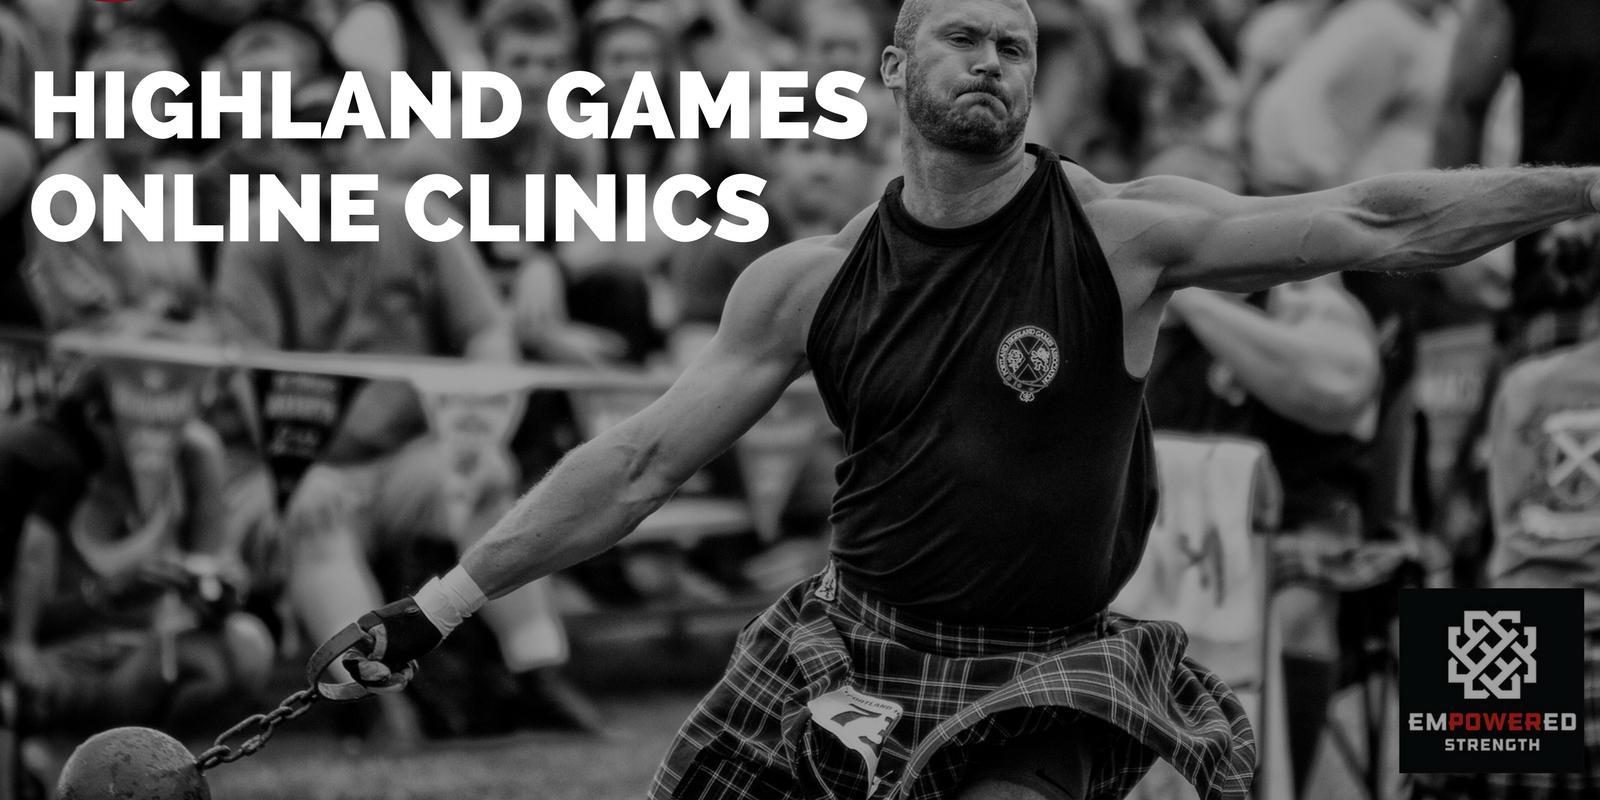 Online highland games clinics empowered strength solutioingenieria Choice Image